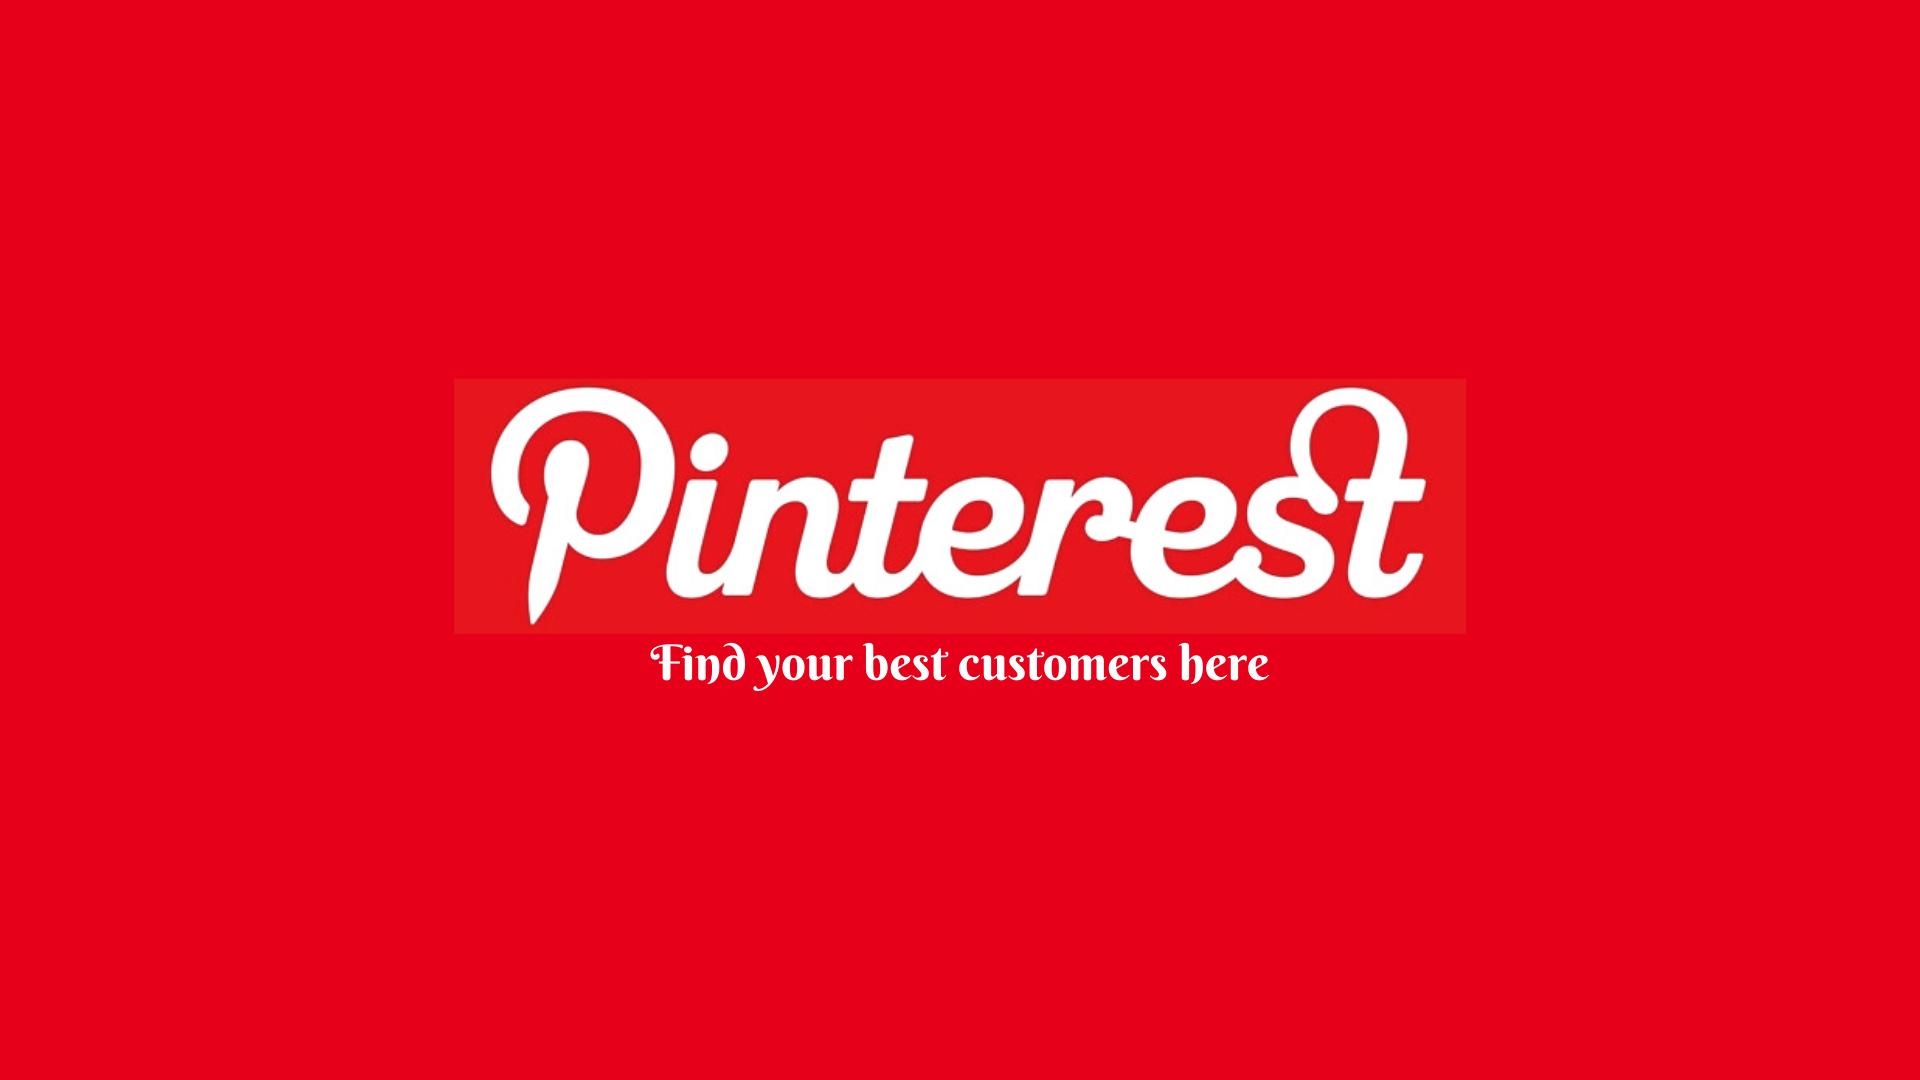 How Pinterest Works